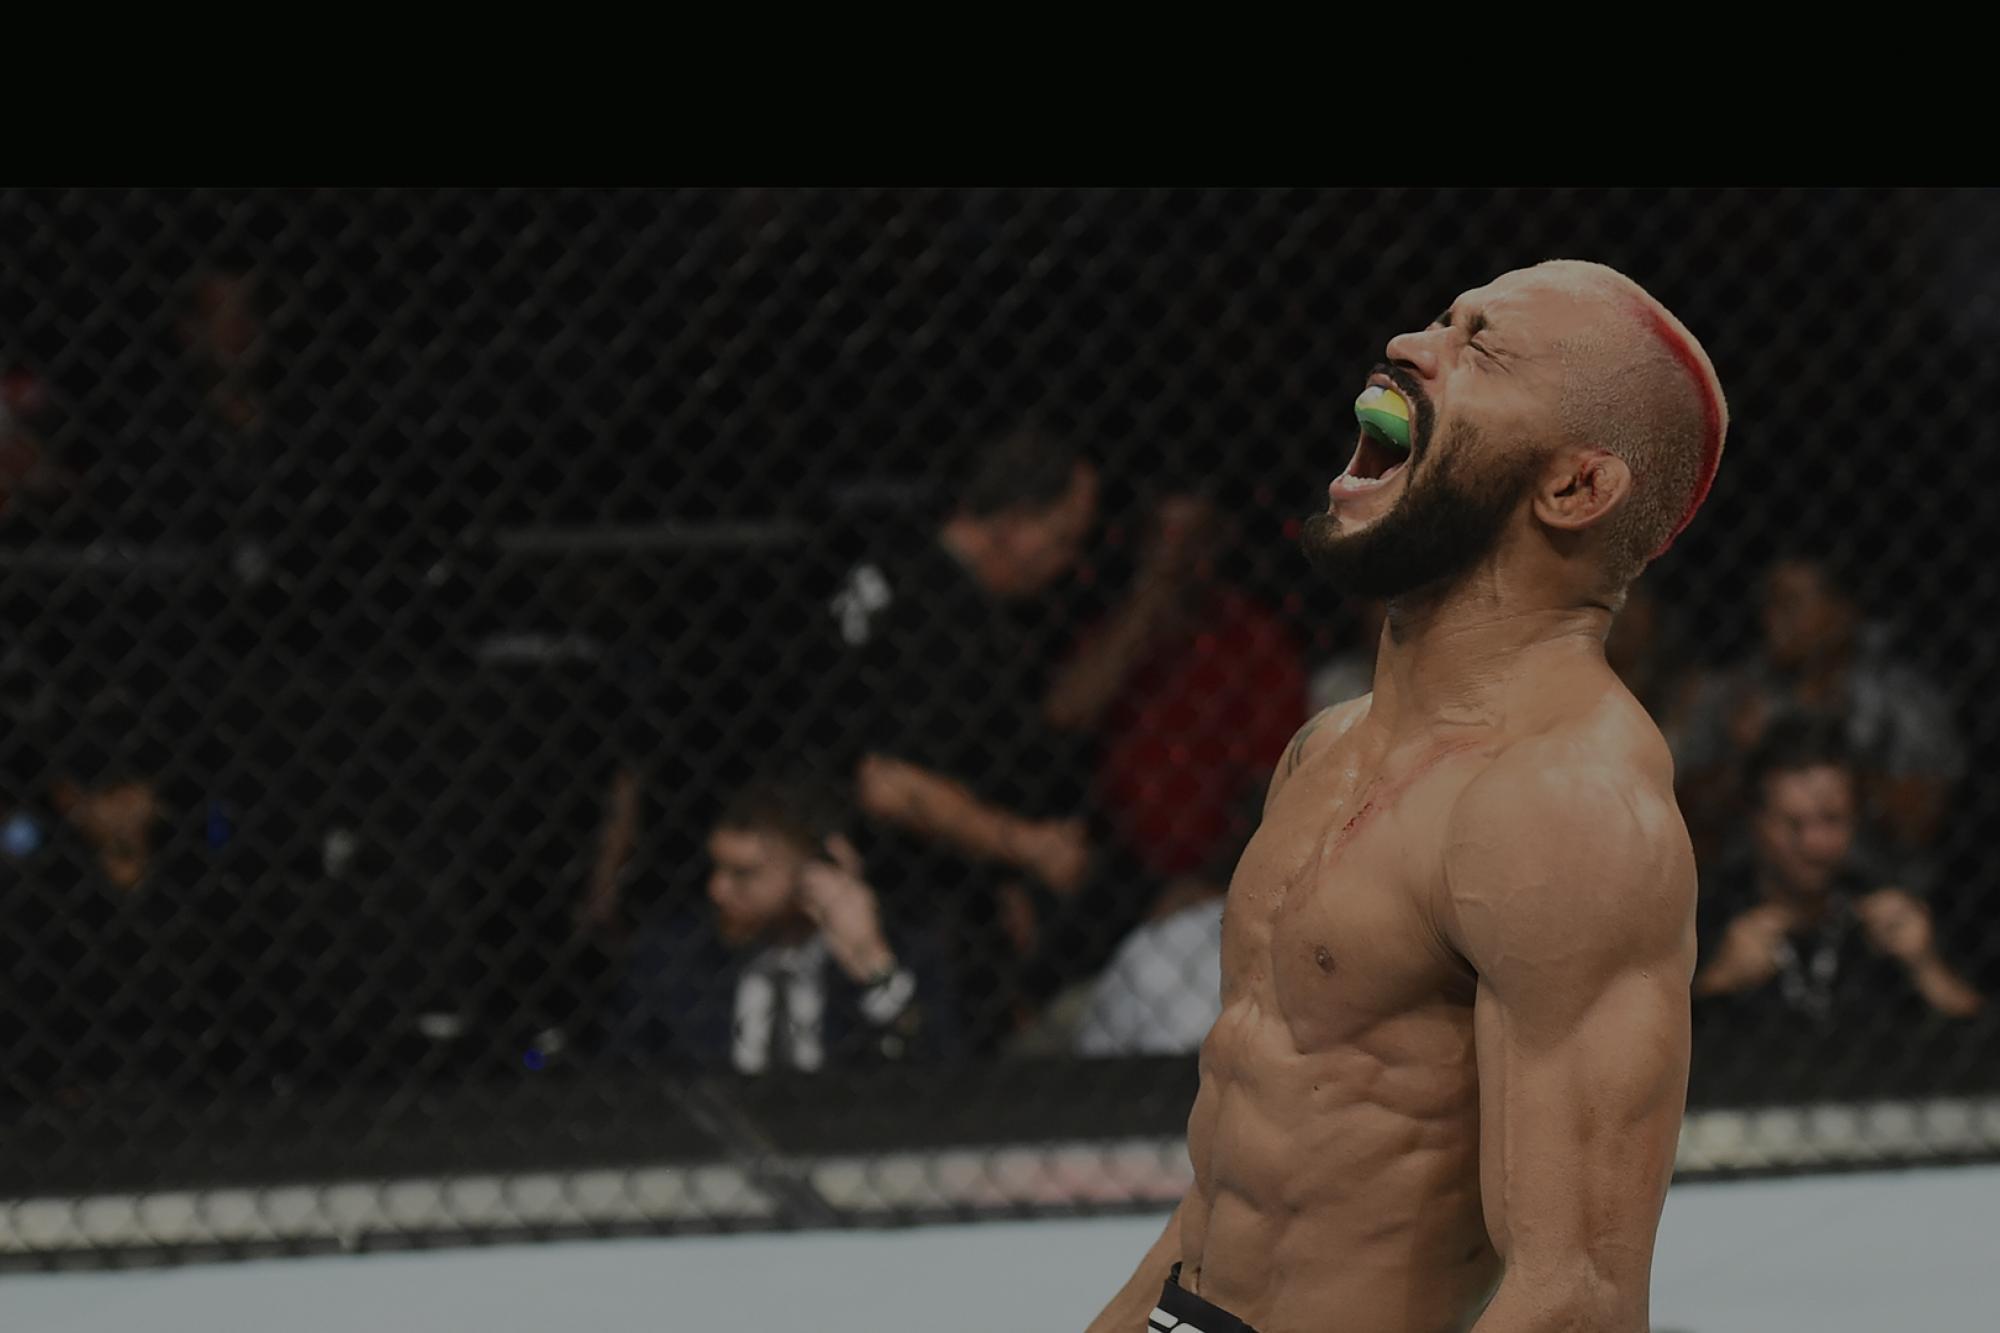 Deiveson Figueiredo intends to finish Joseph Benavidez at UFC Virginia - Deiveson Figueiredo